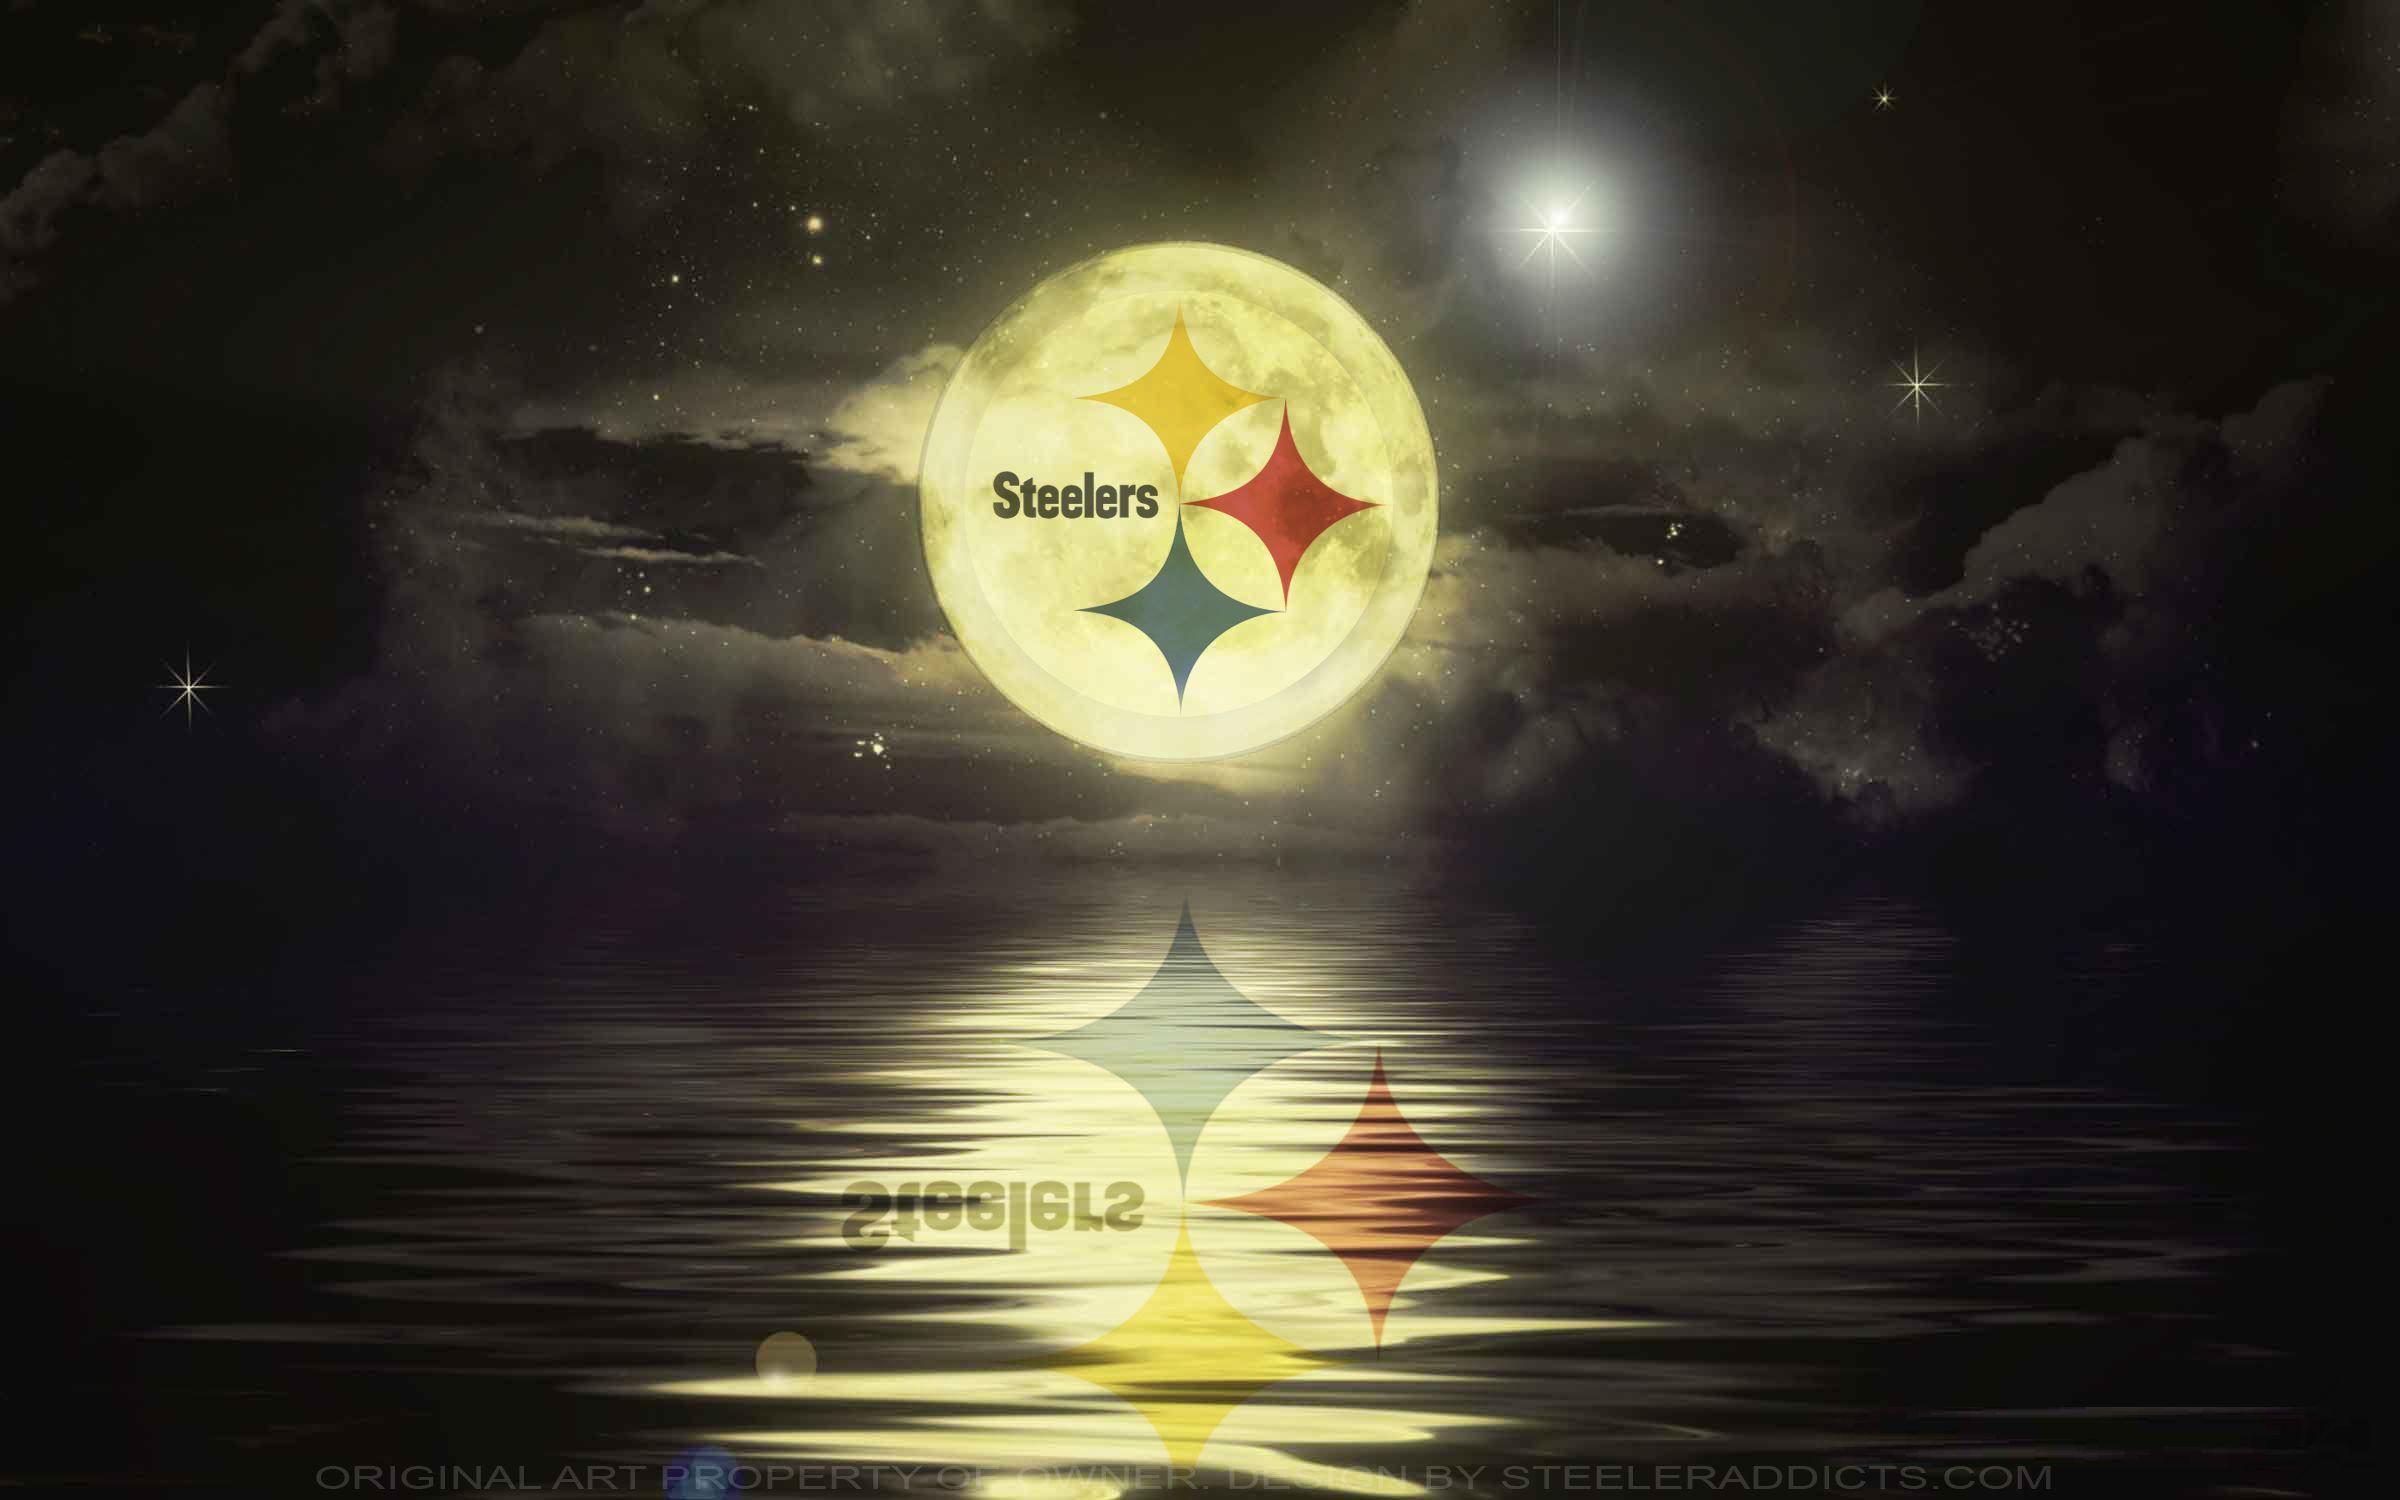 Steelers Wallpaper - Dr. Odd